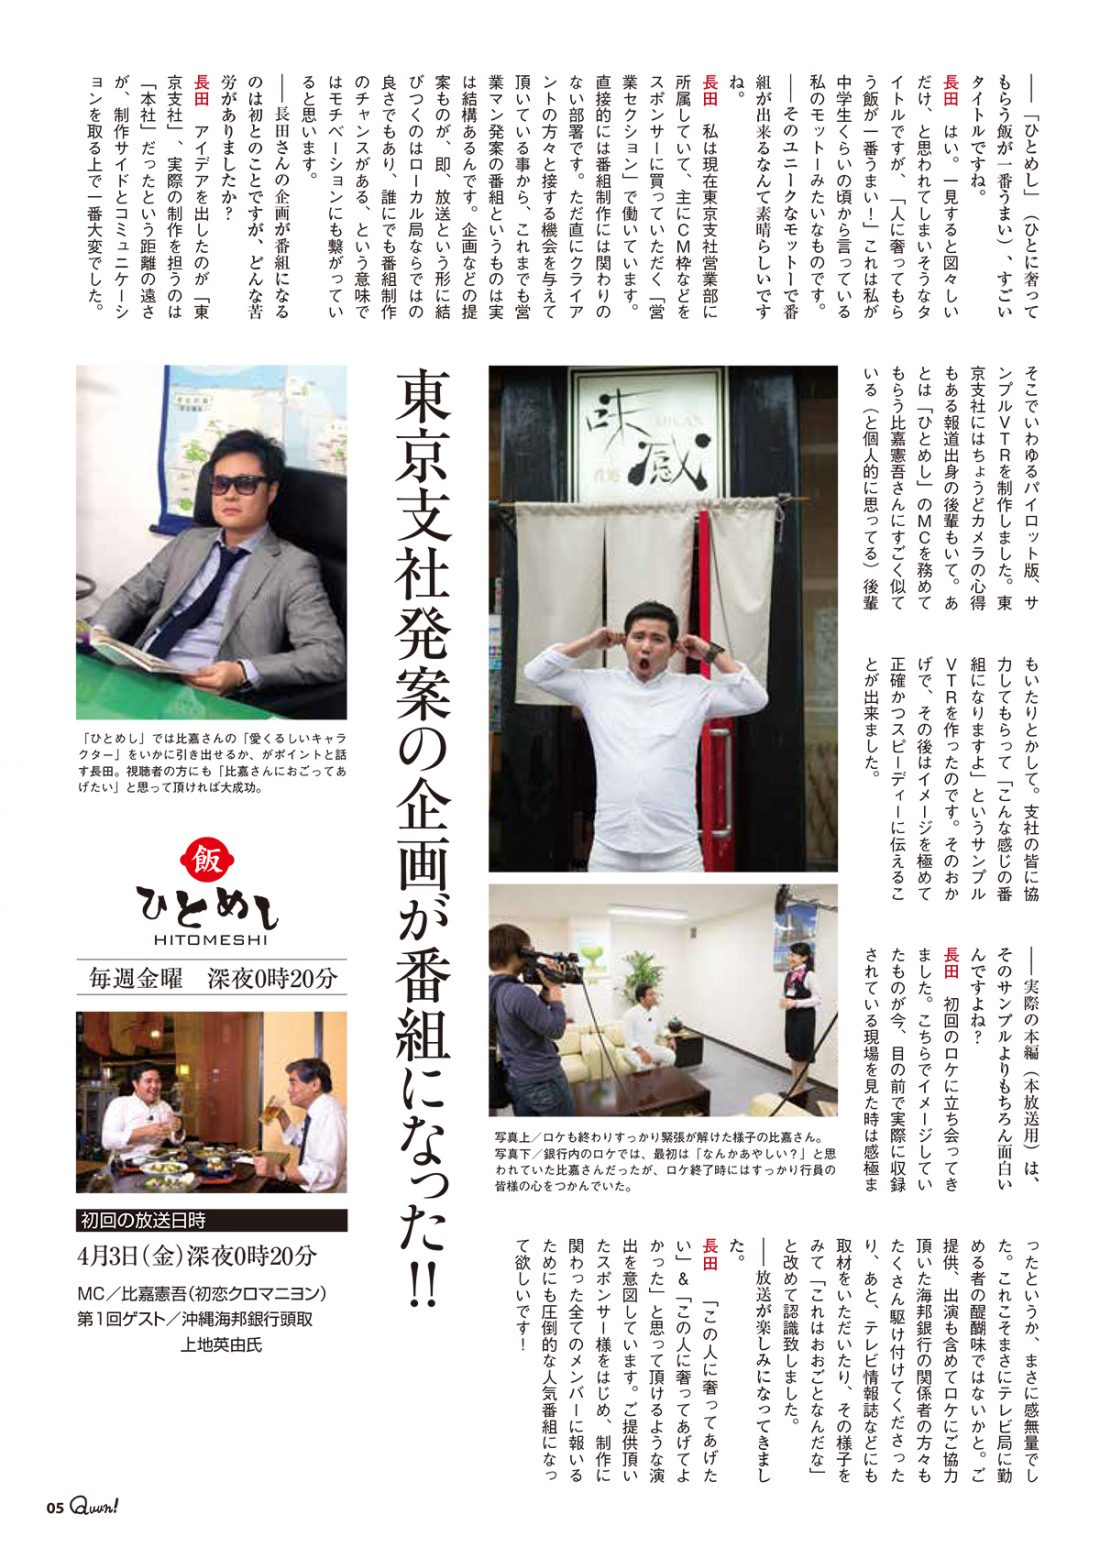 http://www.qab.co.jp/qgoro/wp-content/uploads/quun_0307-1100x1558.jpg